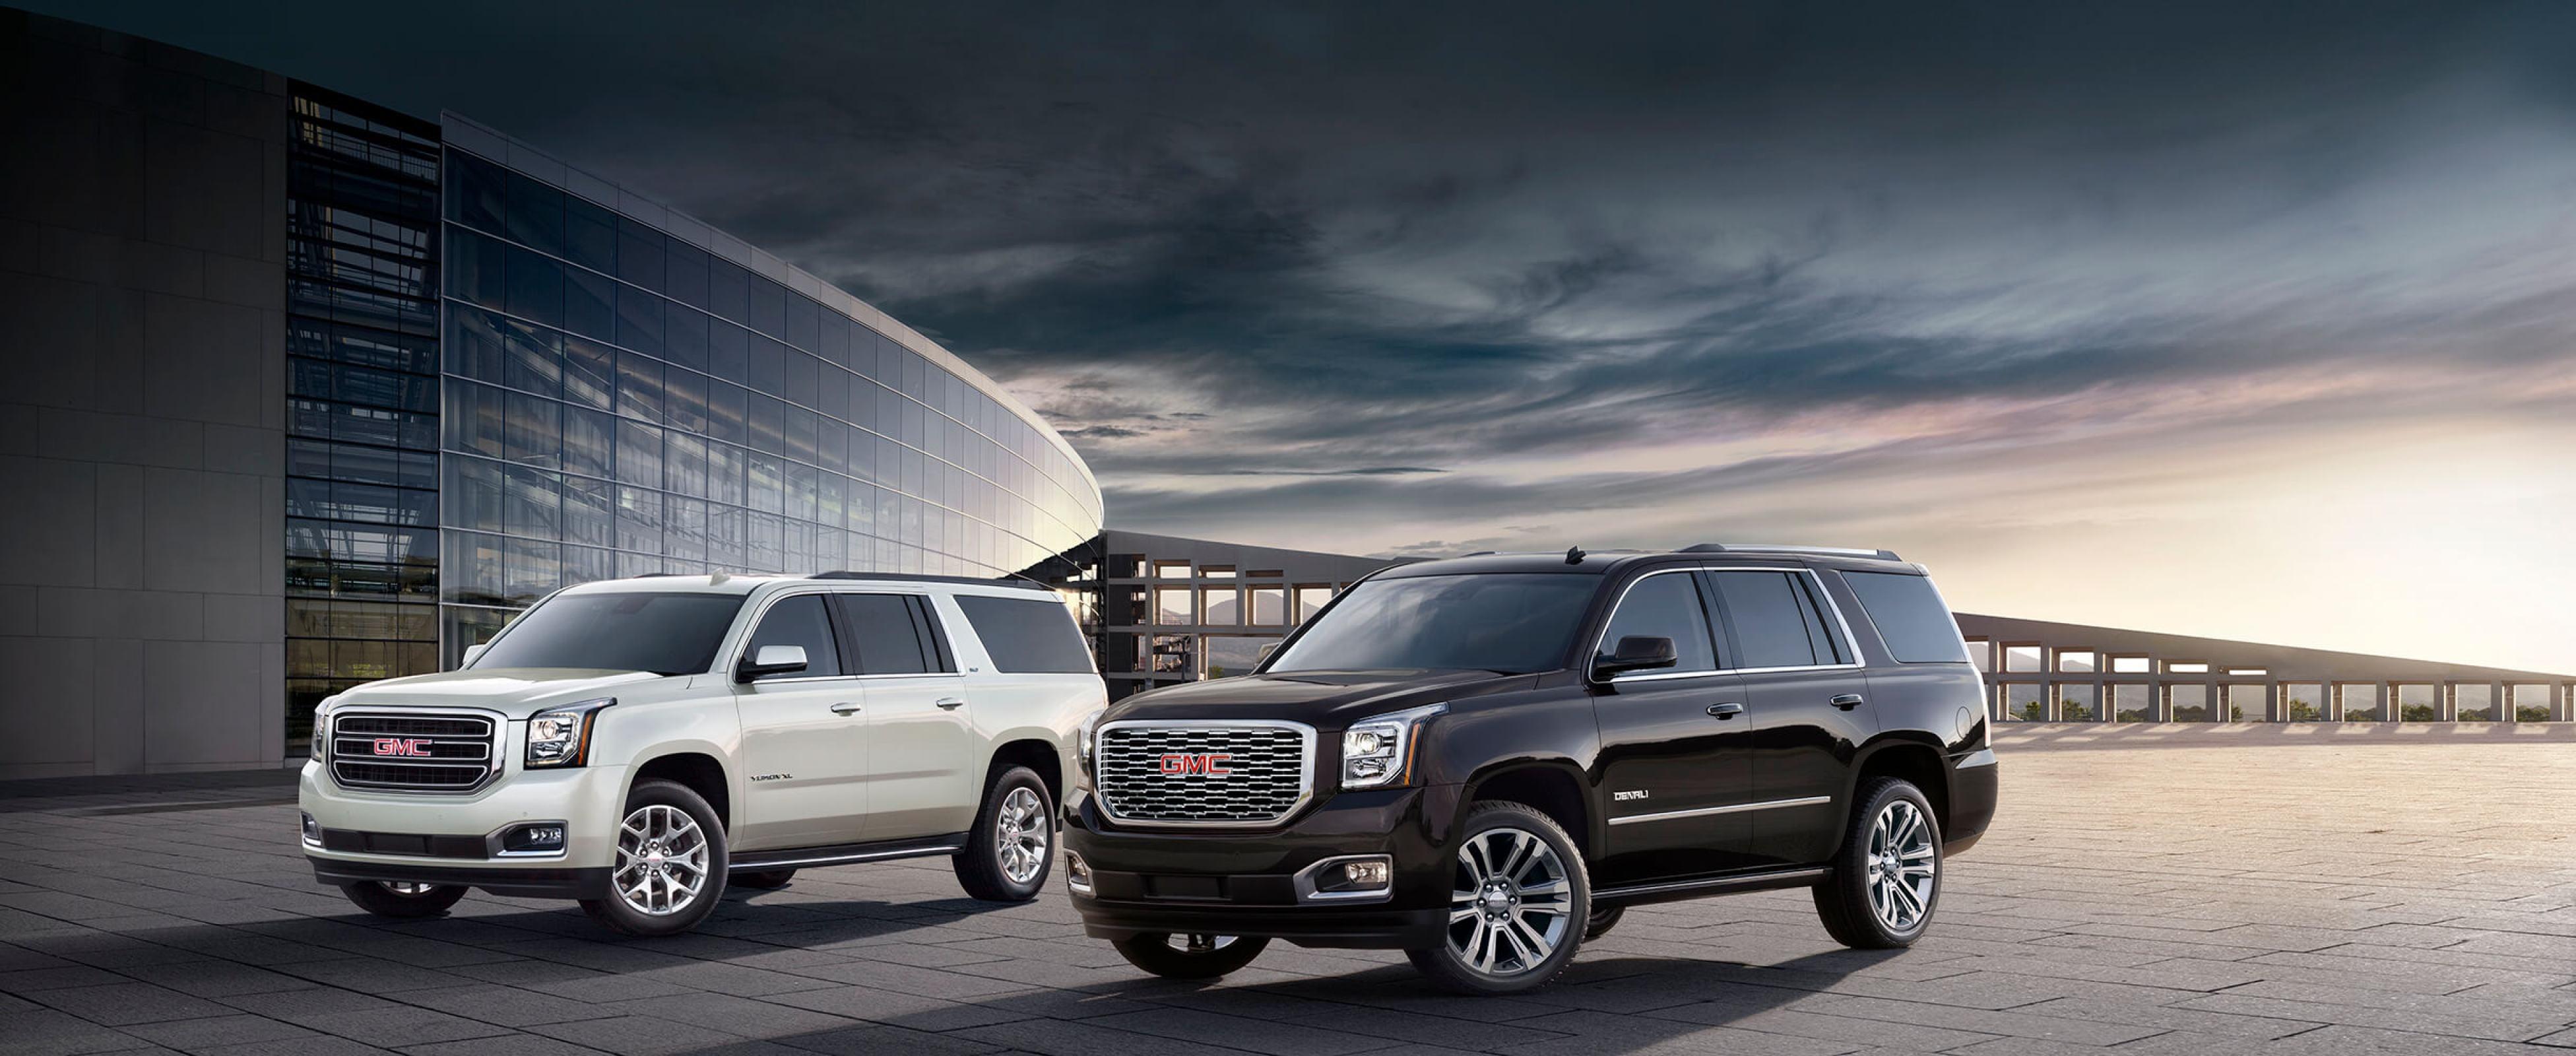 Premium Elite Suv Rental Yukon Denali Or Similar Budget Rent A Car